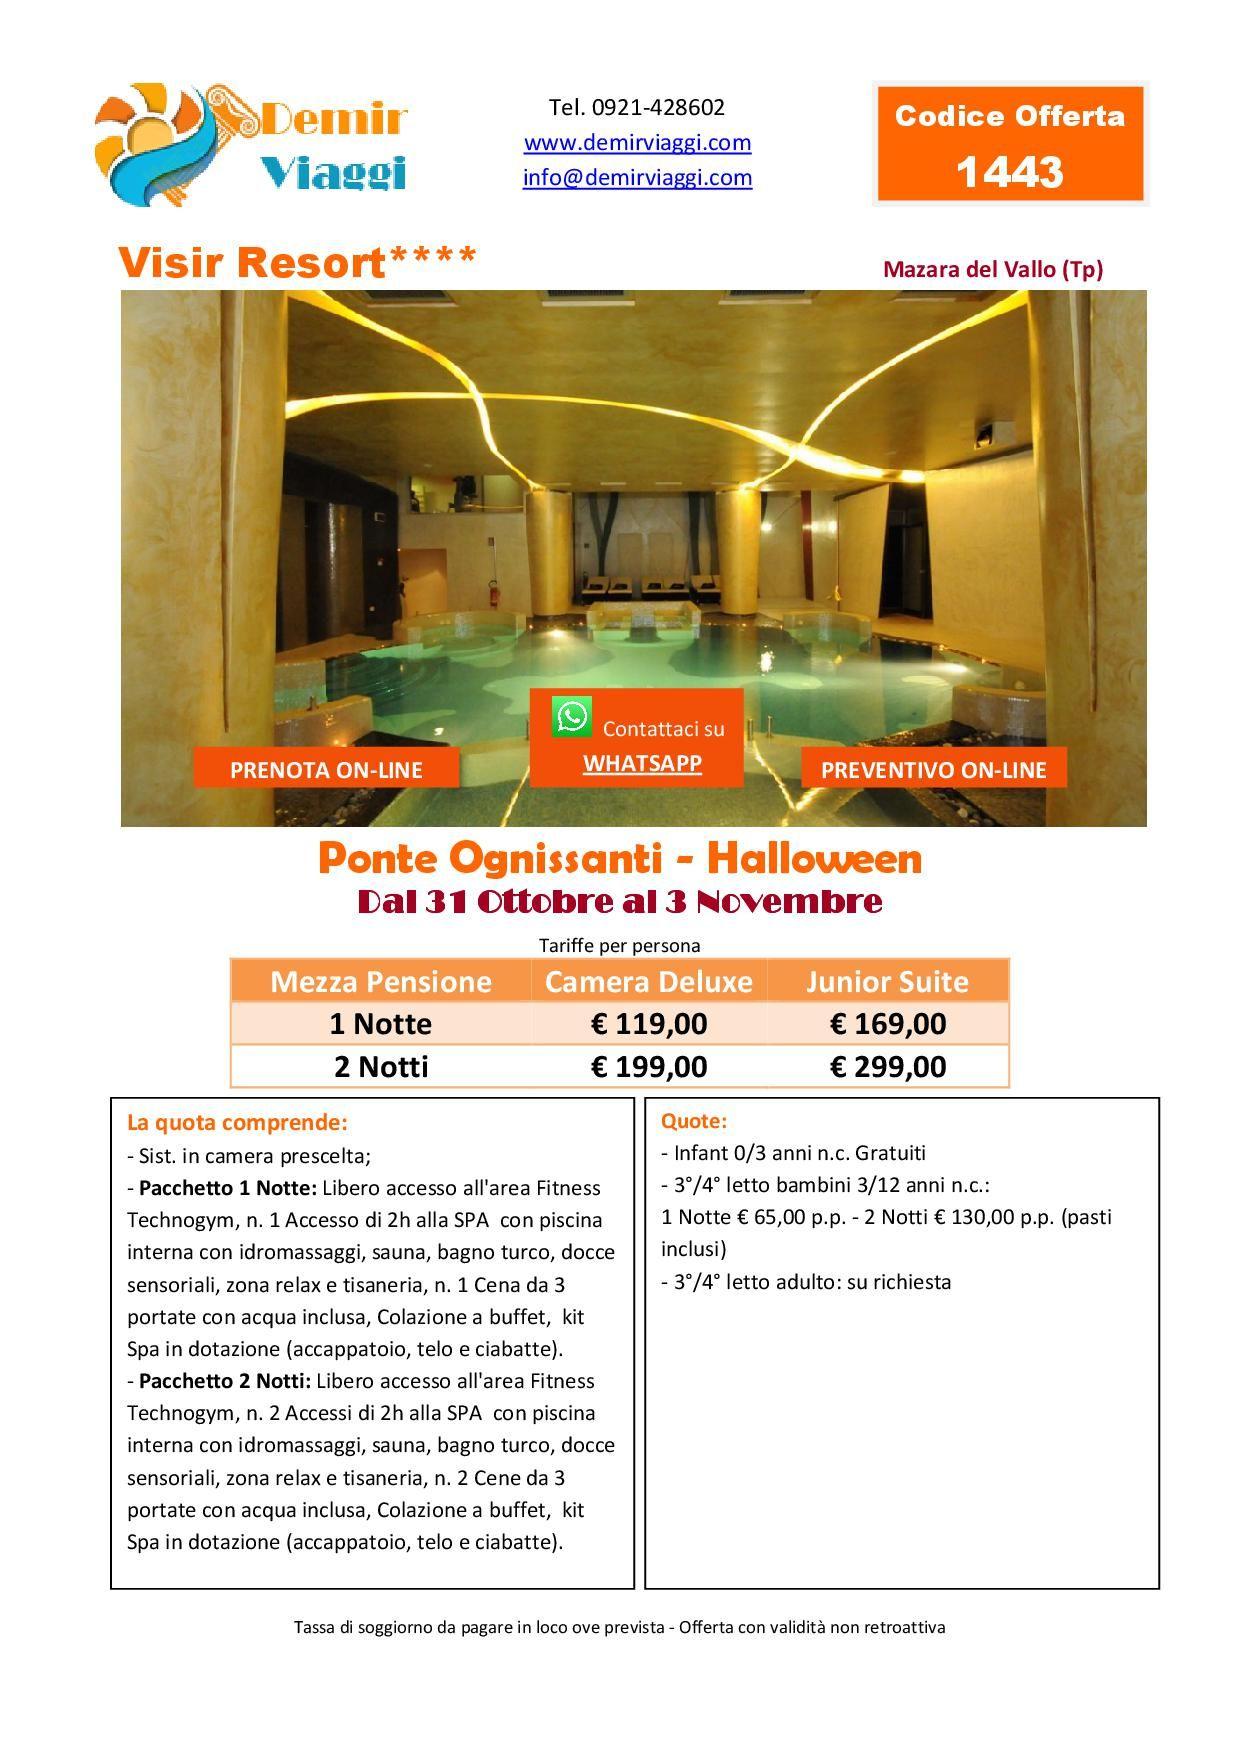 Visir Resort**** - Mazara del Vallo (Tp) Ponte Ognissanti ...